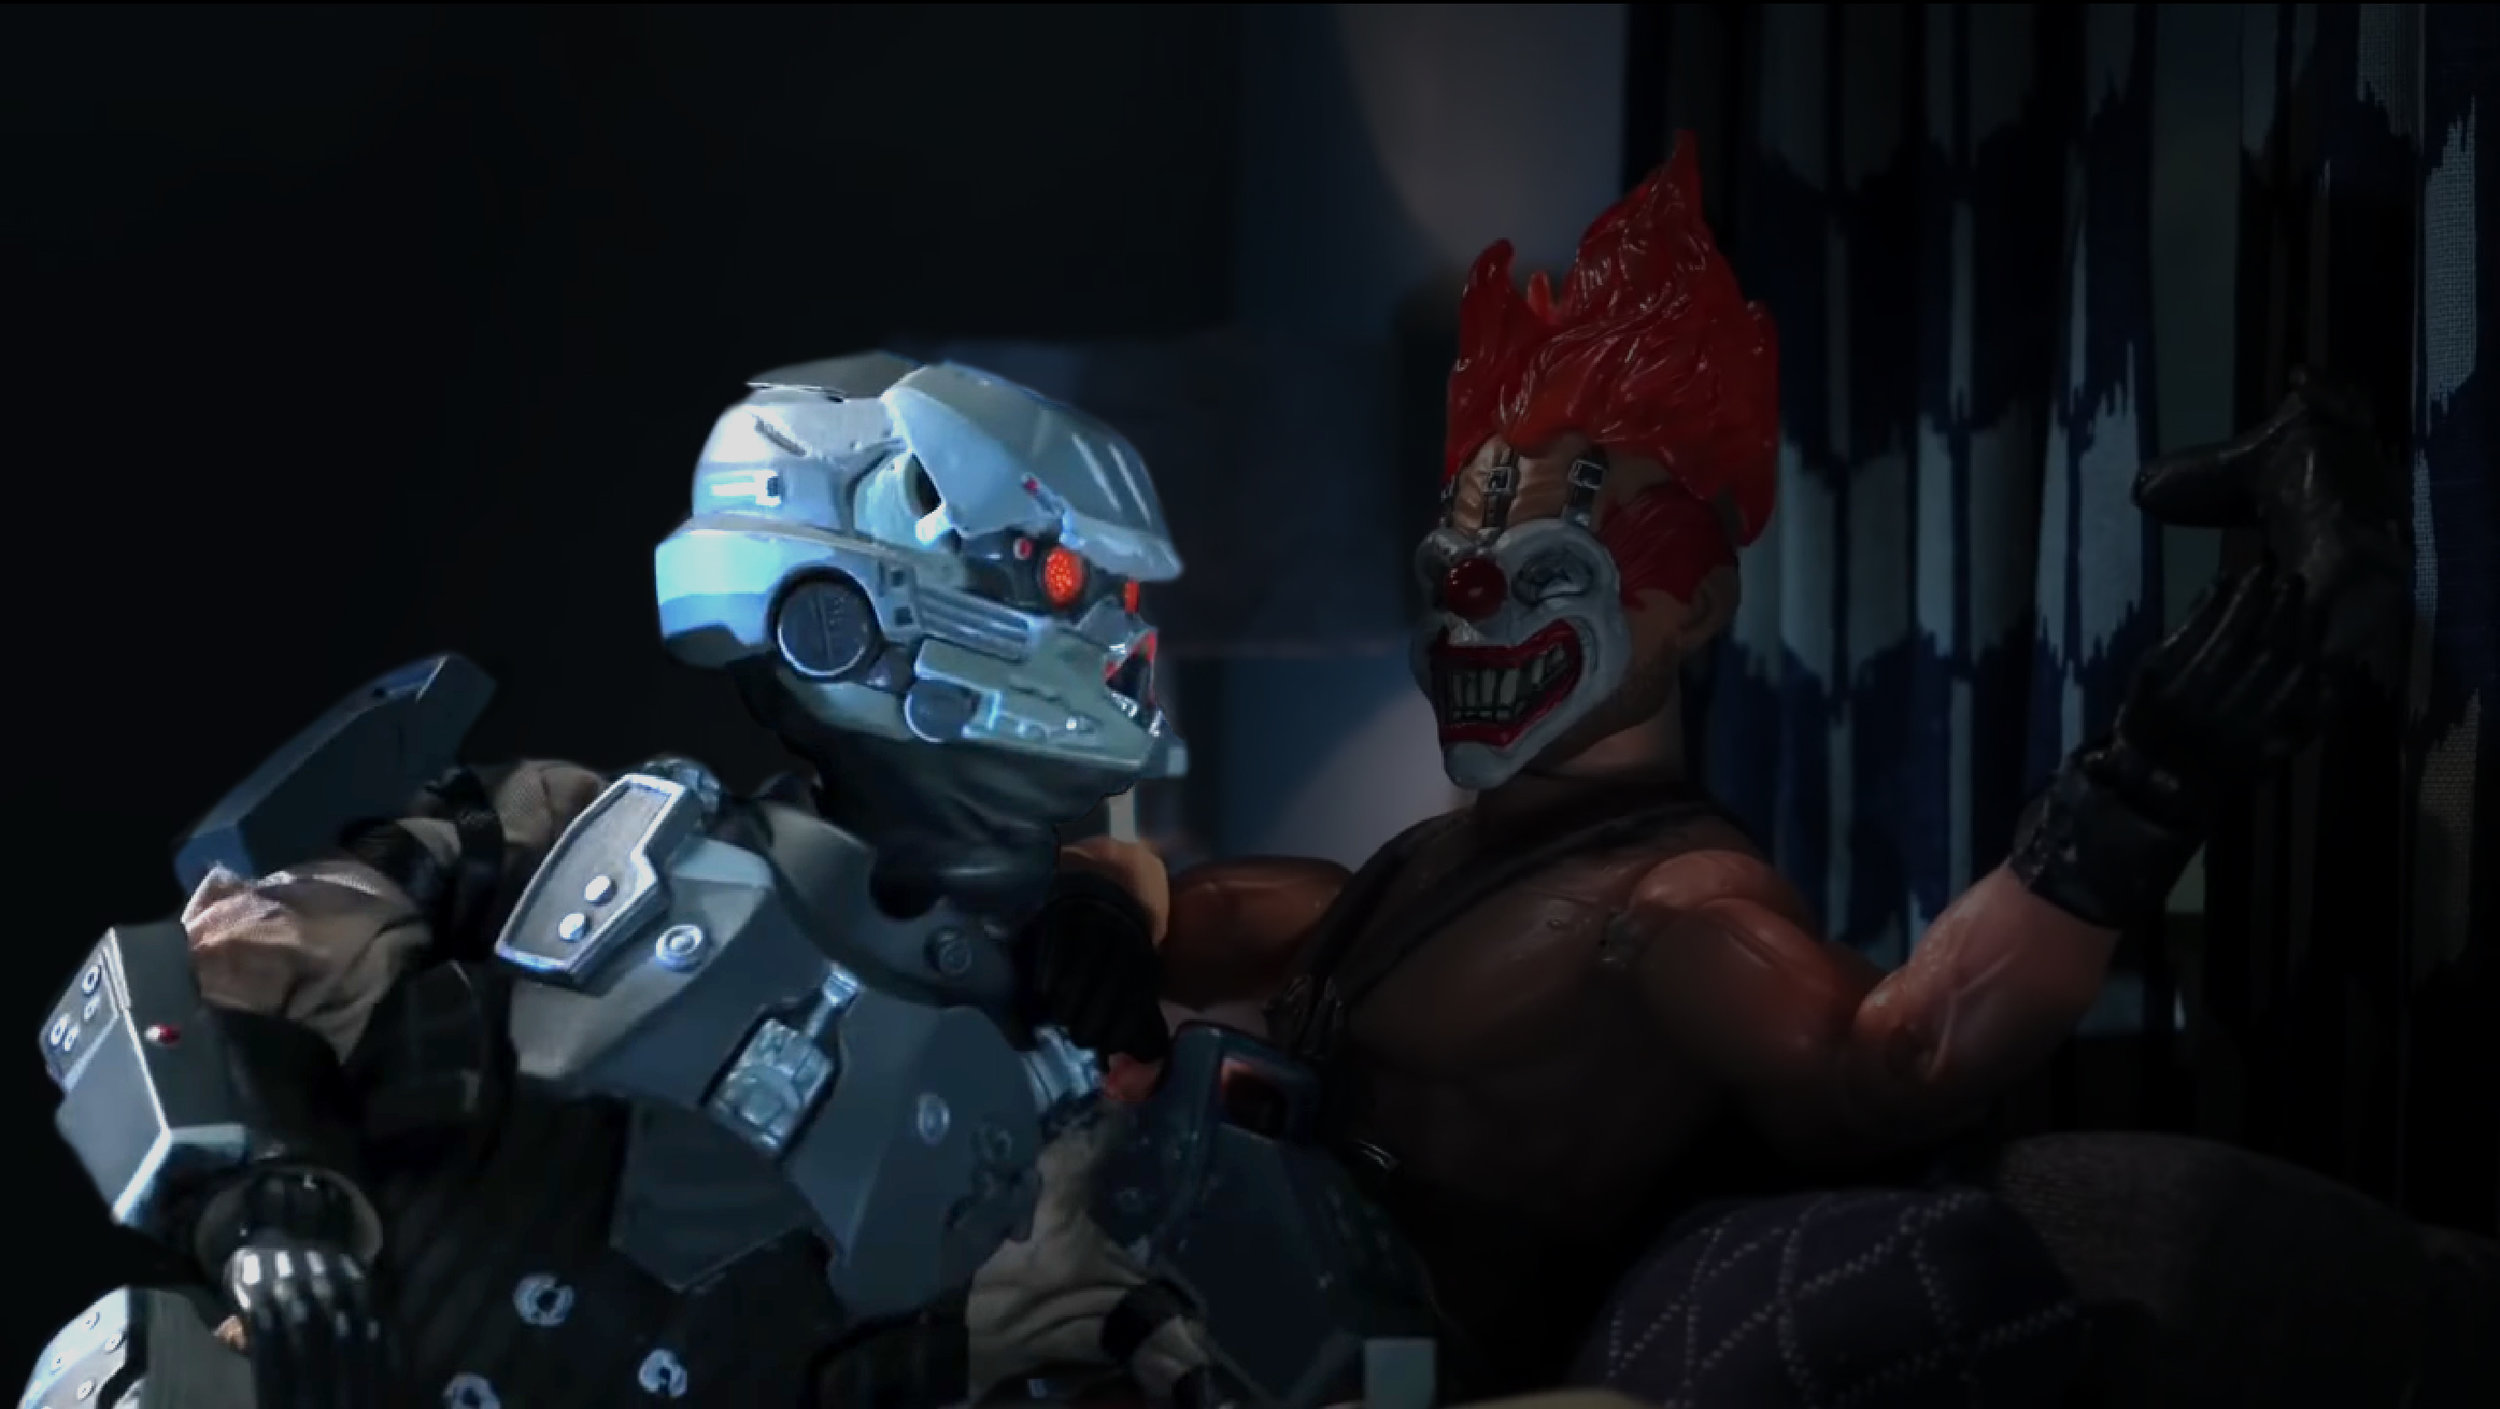 PS4 Killzone Commercial - Puppet Dept